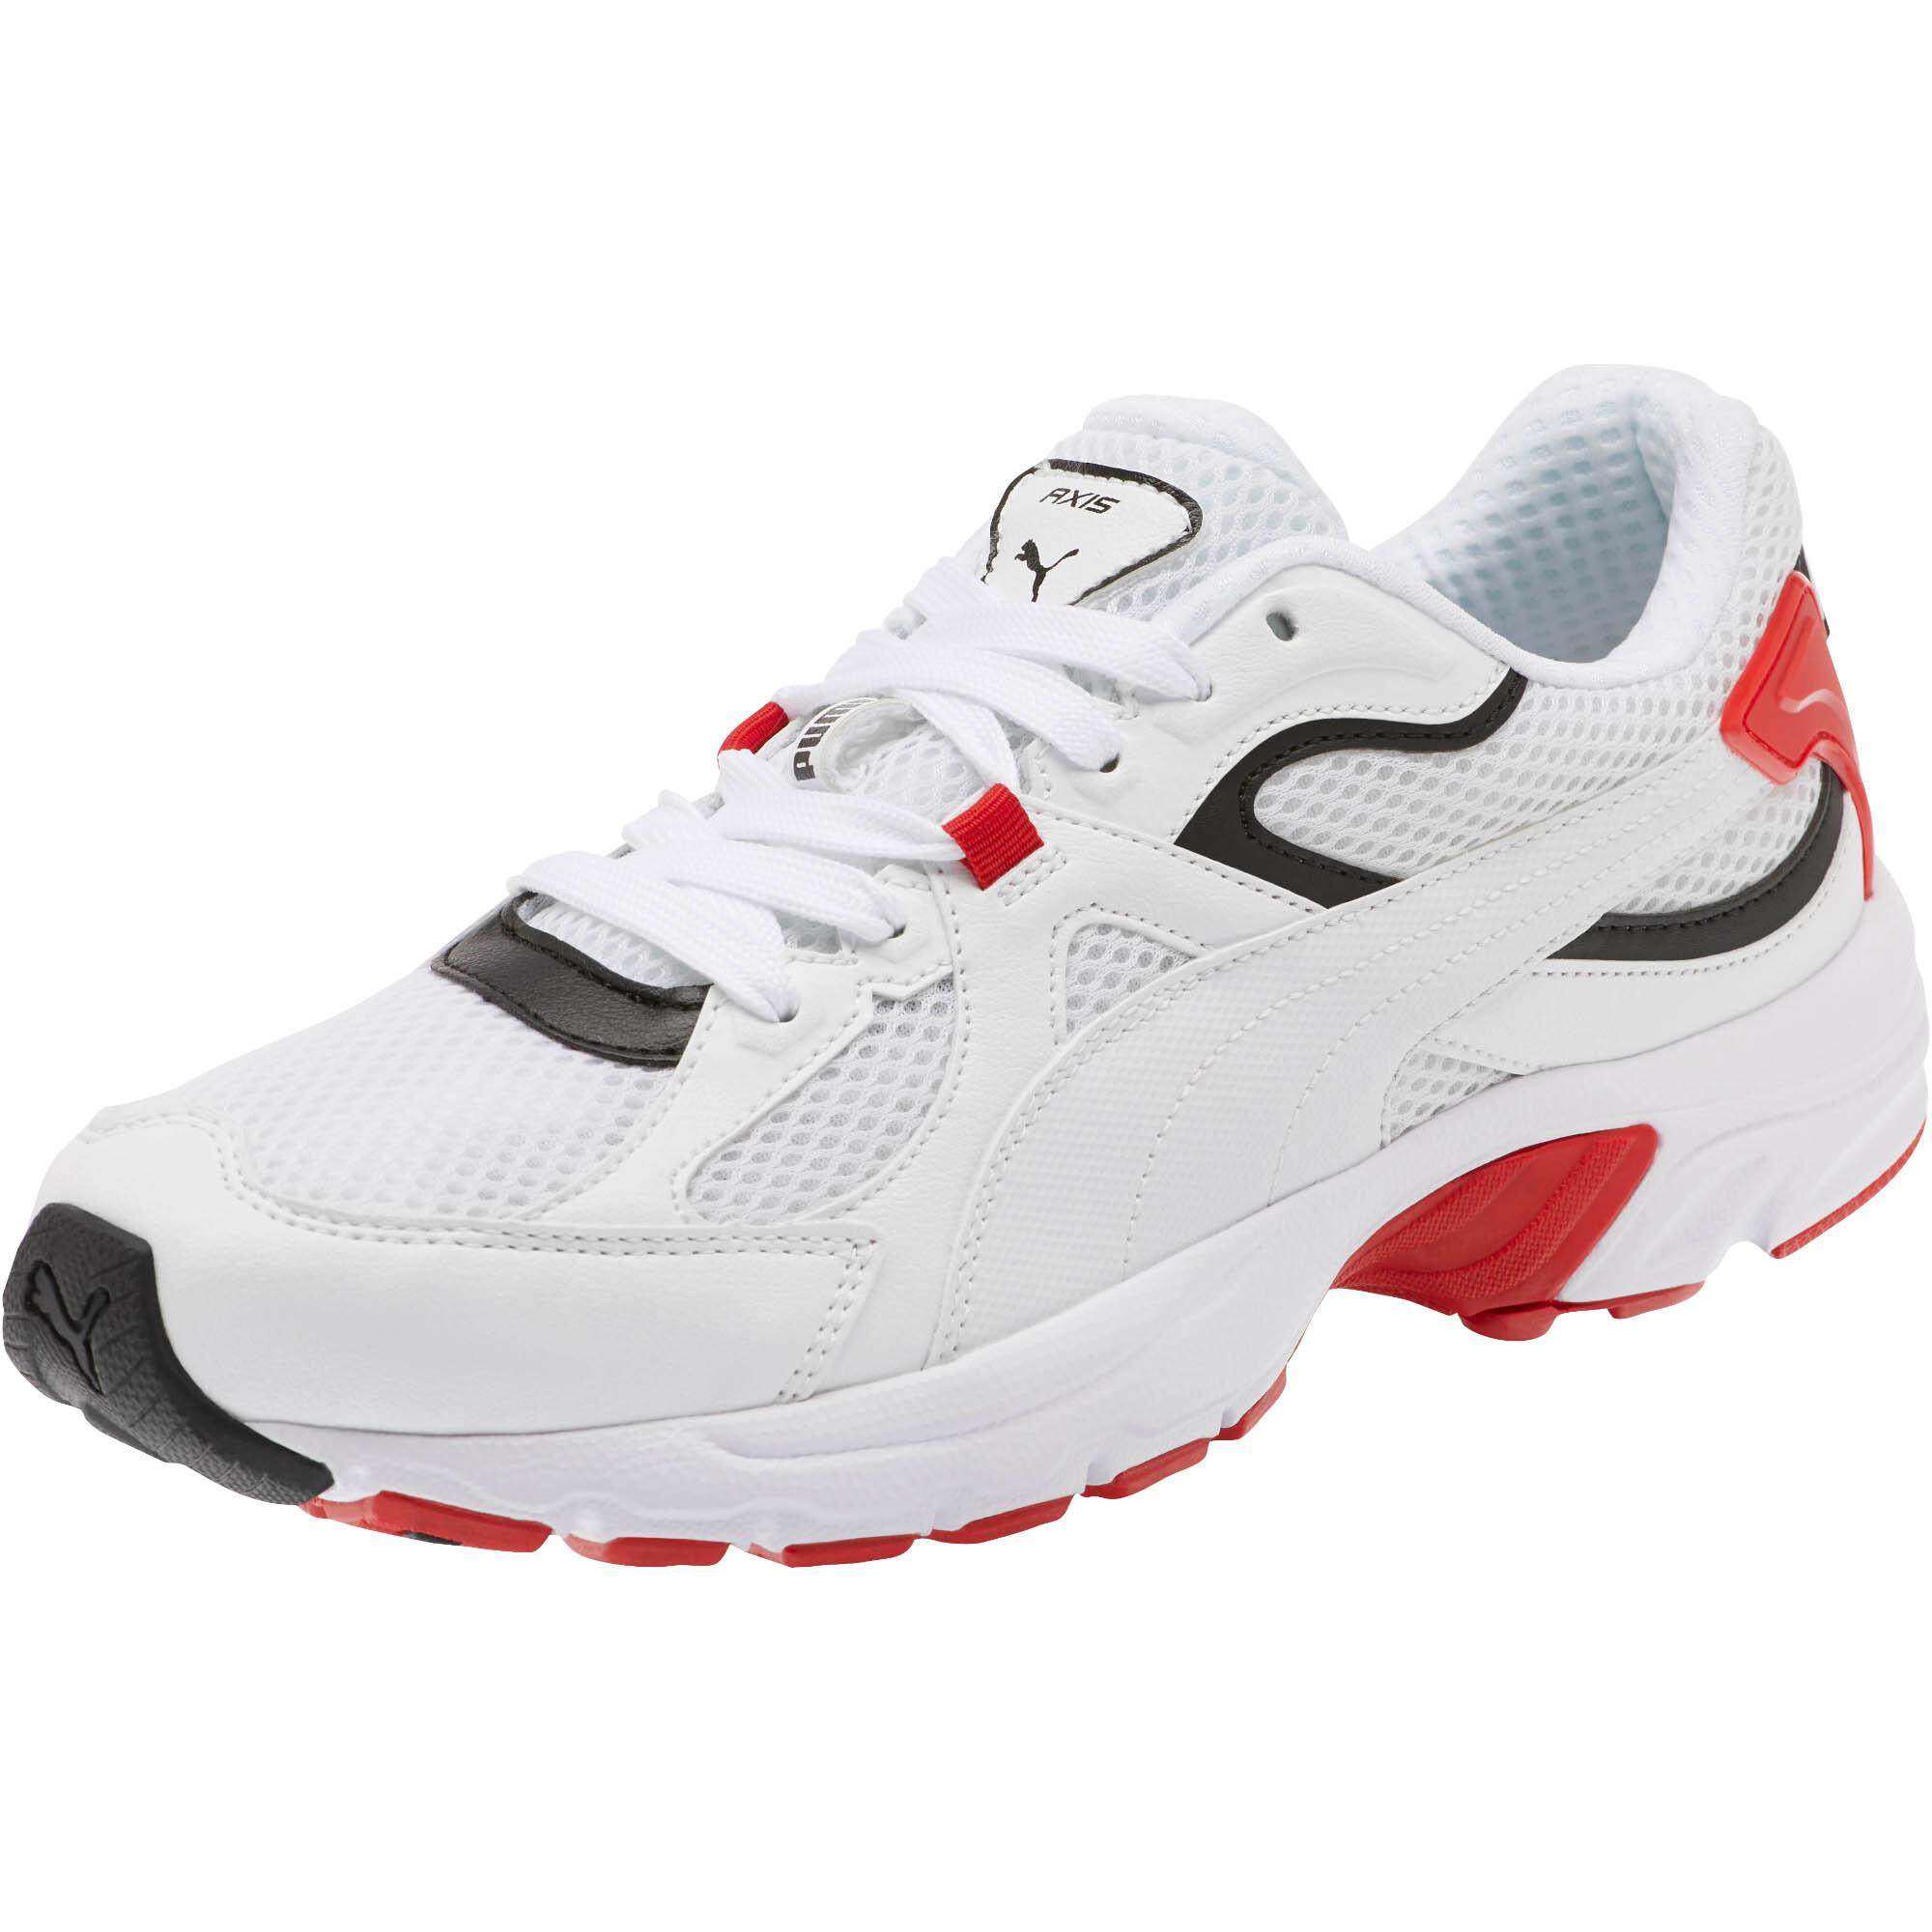 PUMA-Axis-Plus-90s-Sneakers-Men-Shoe-Basics thumbnail 12